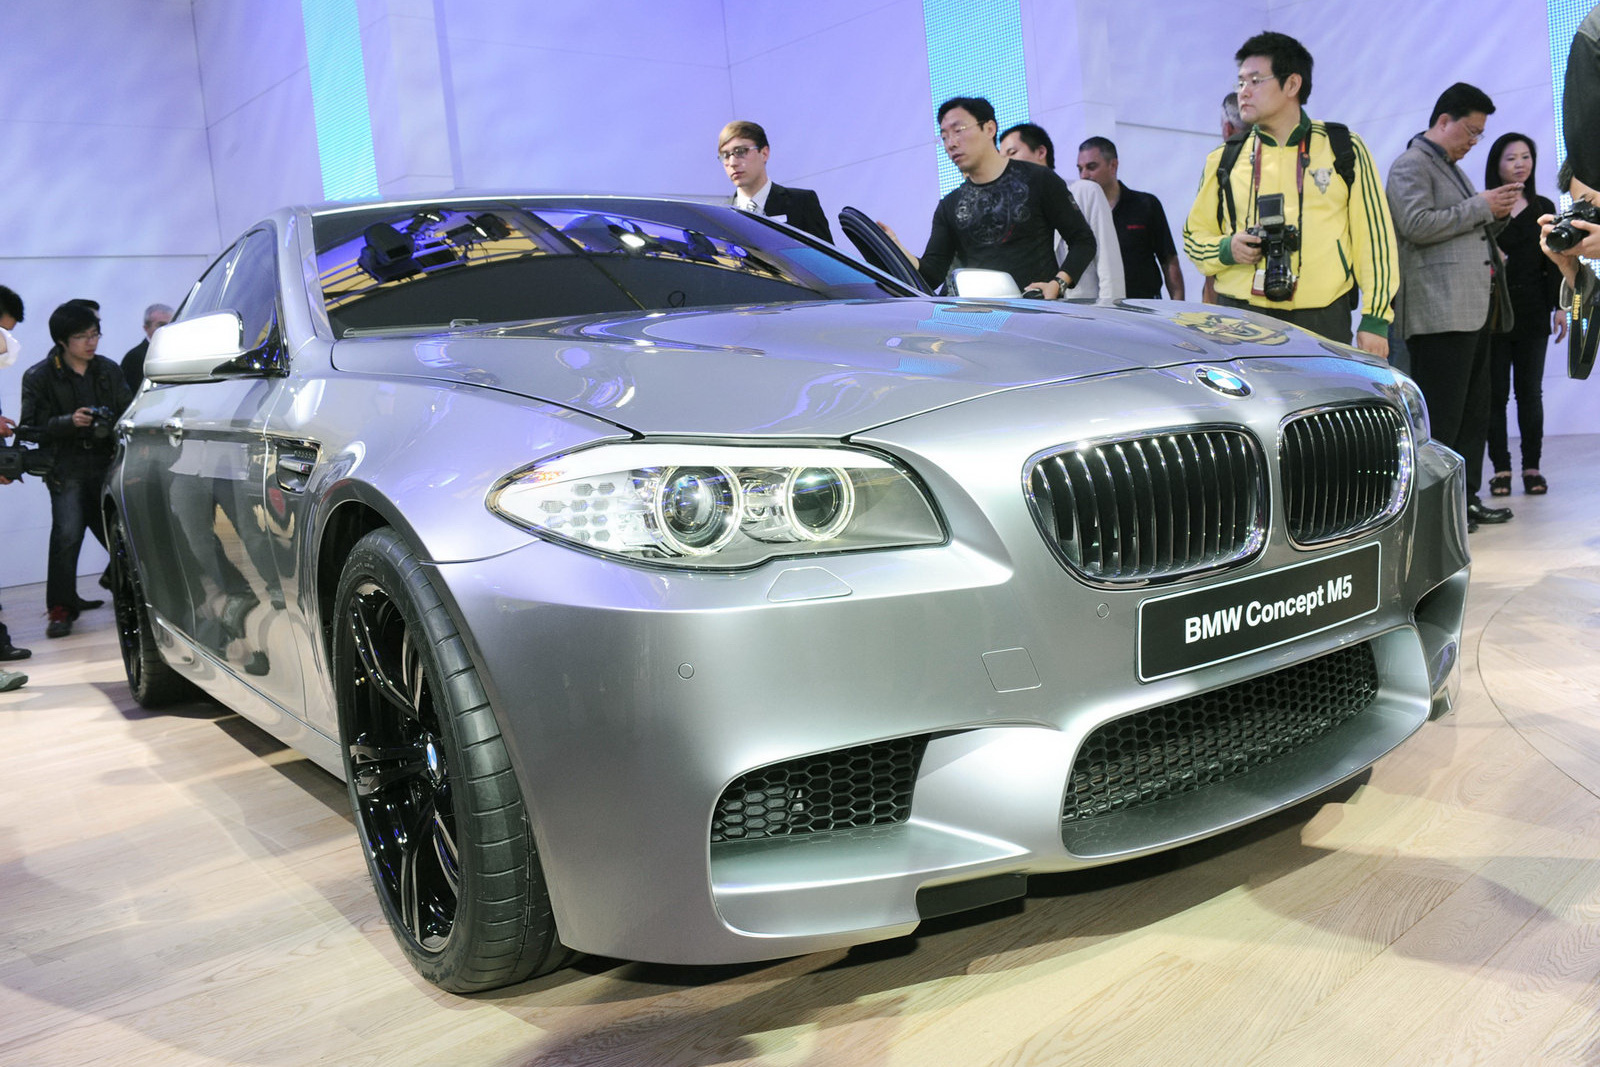 BMW CONCEPT IN SHANGHAI AUTO